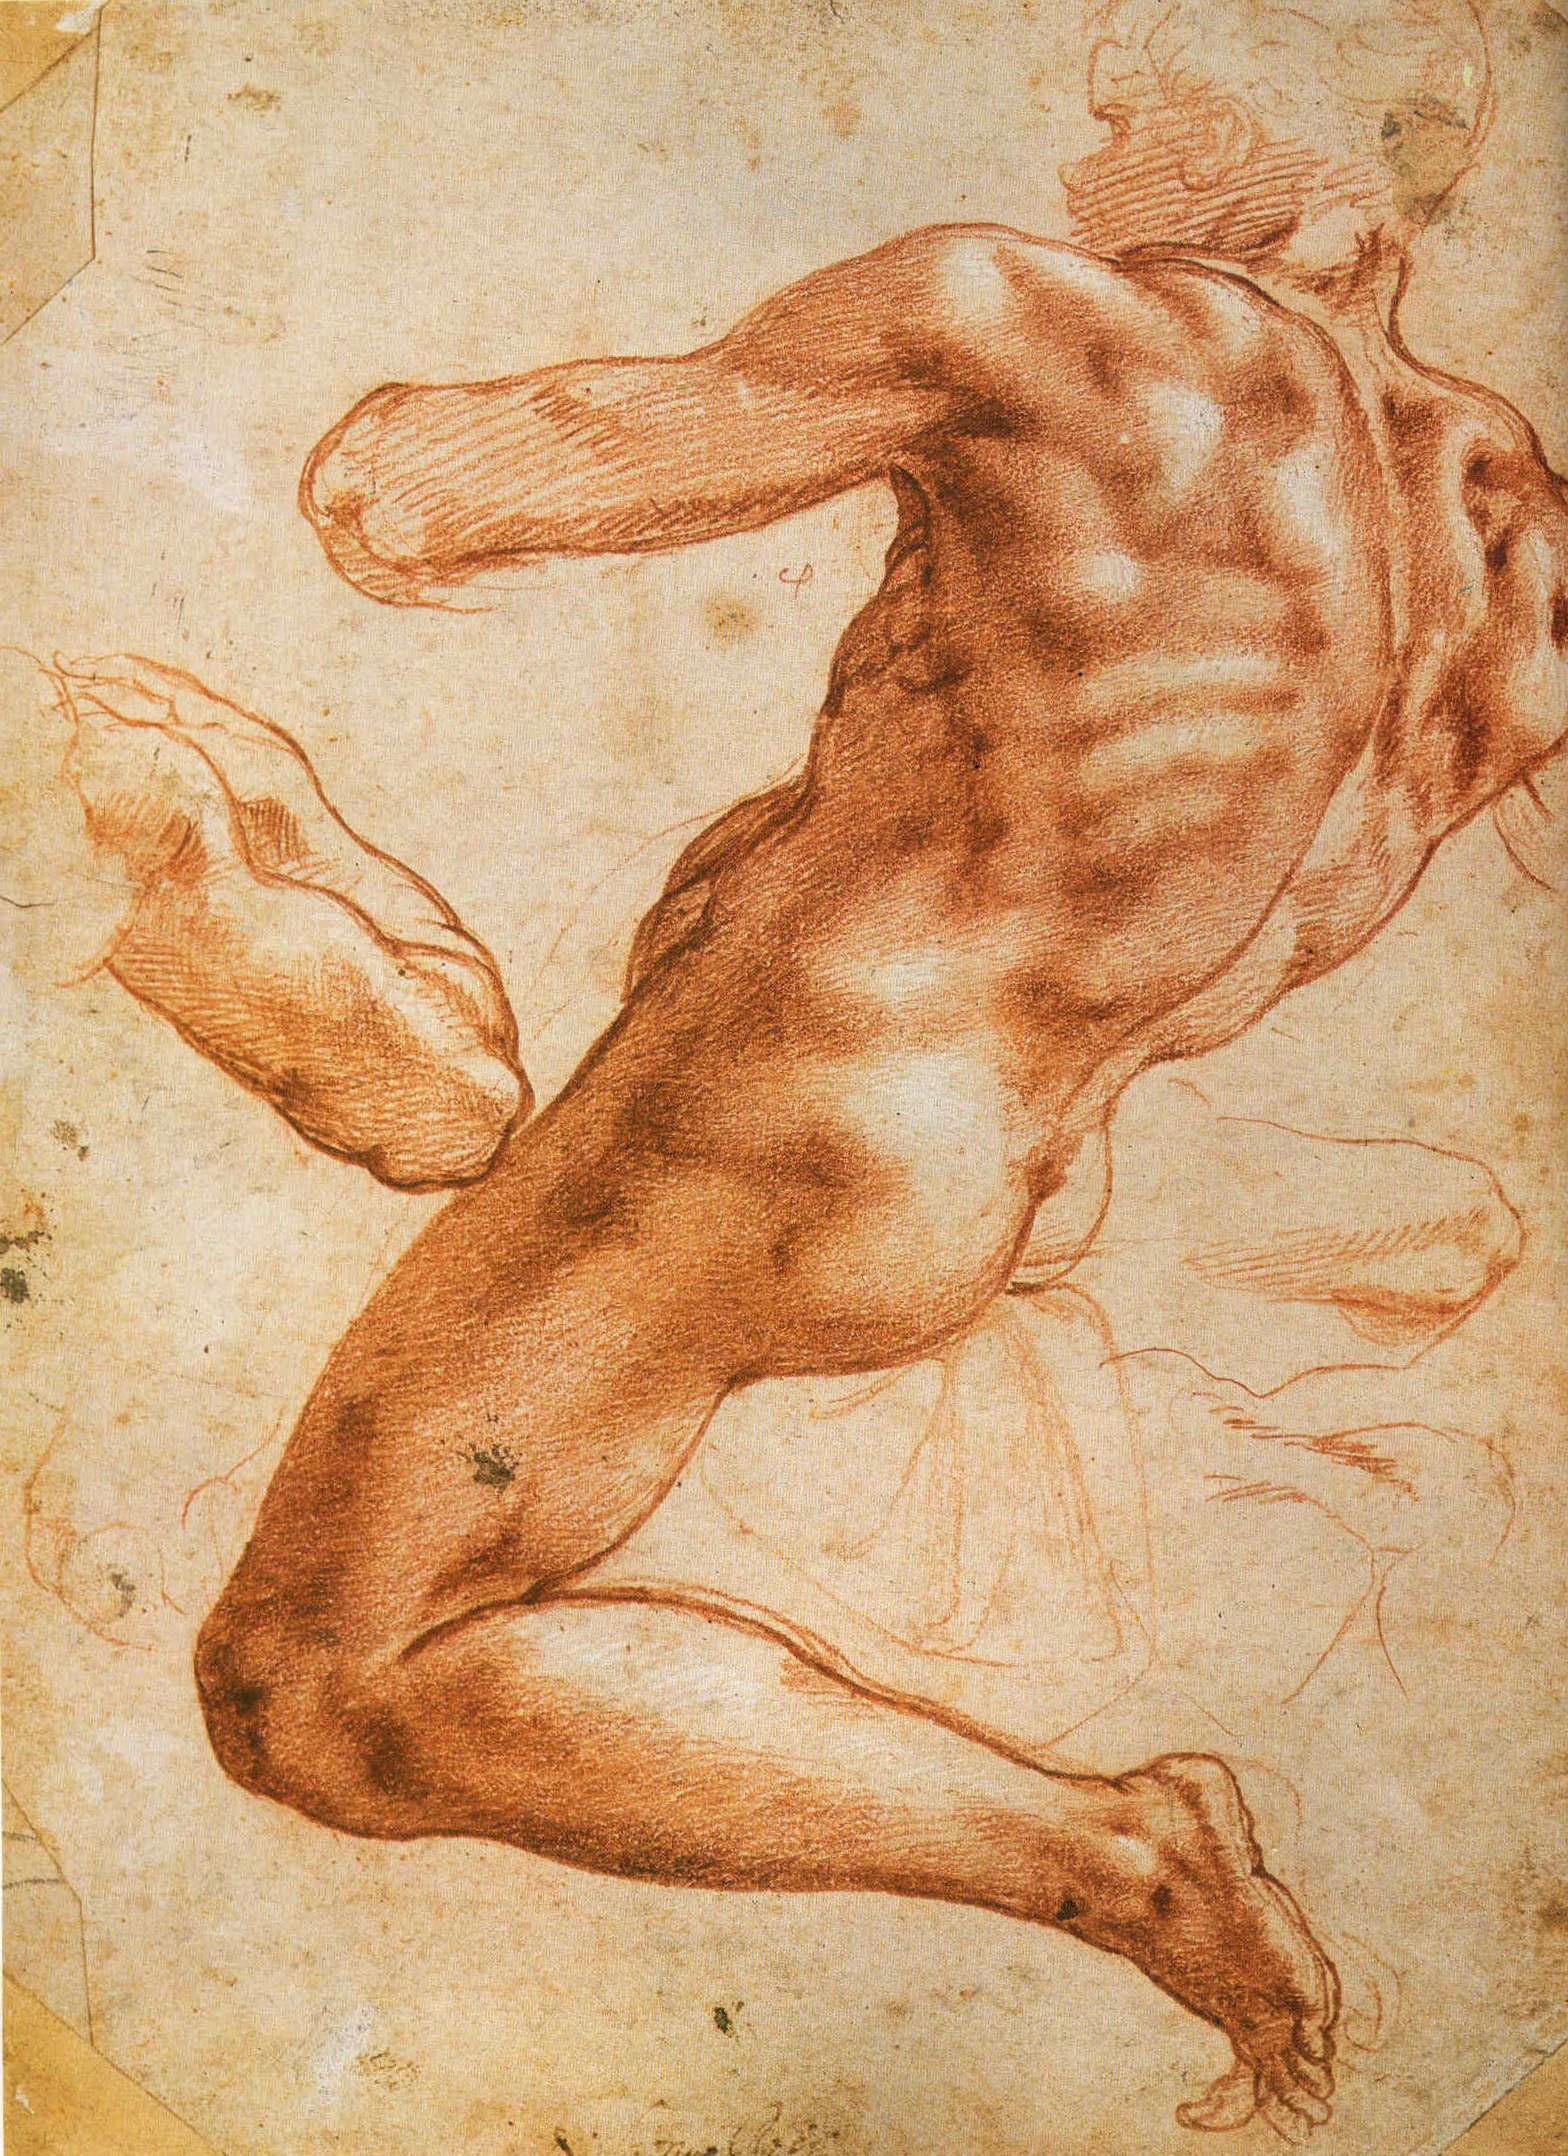 Рисунки и наброски Микеланджело Буонаротти